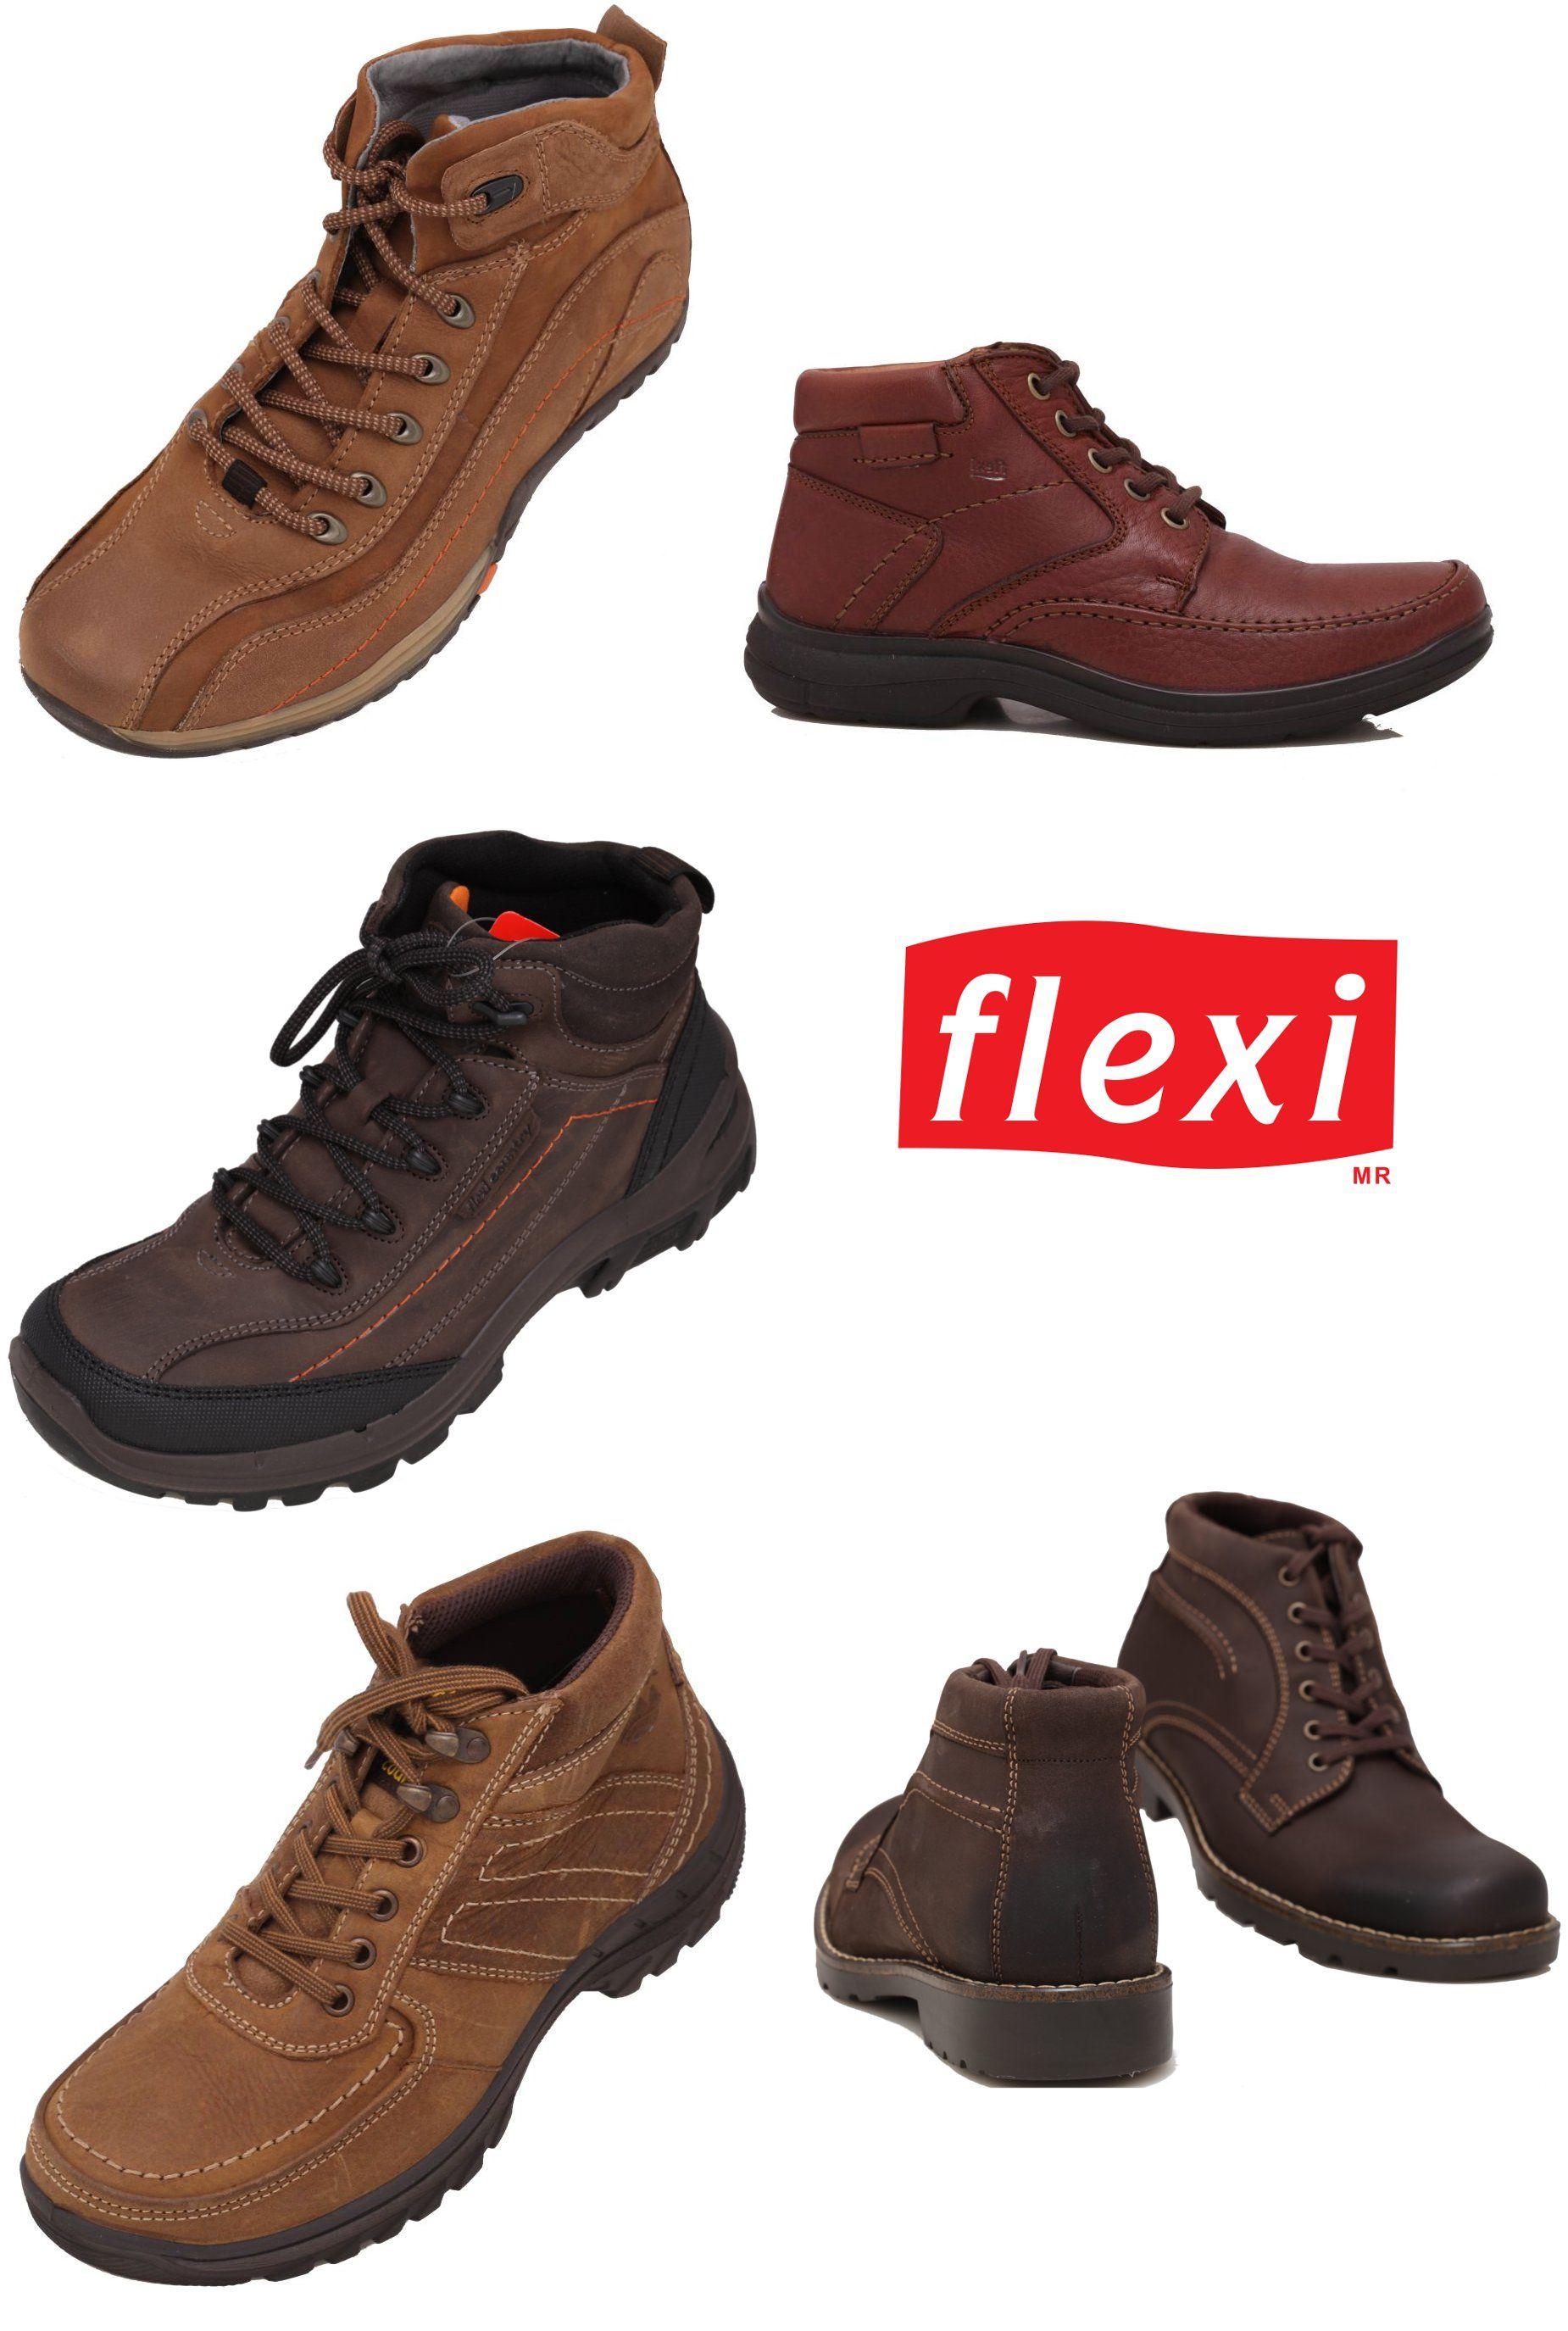 Botas #Flexi para #Hombre modelos 2014 disponibles en